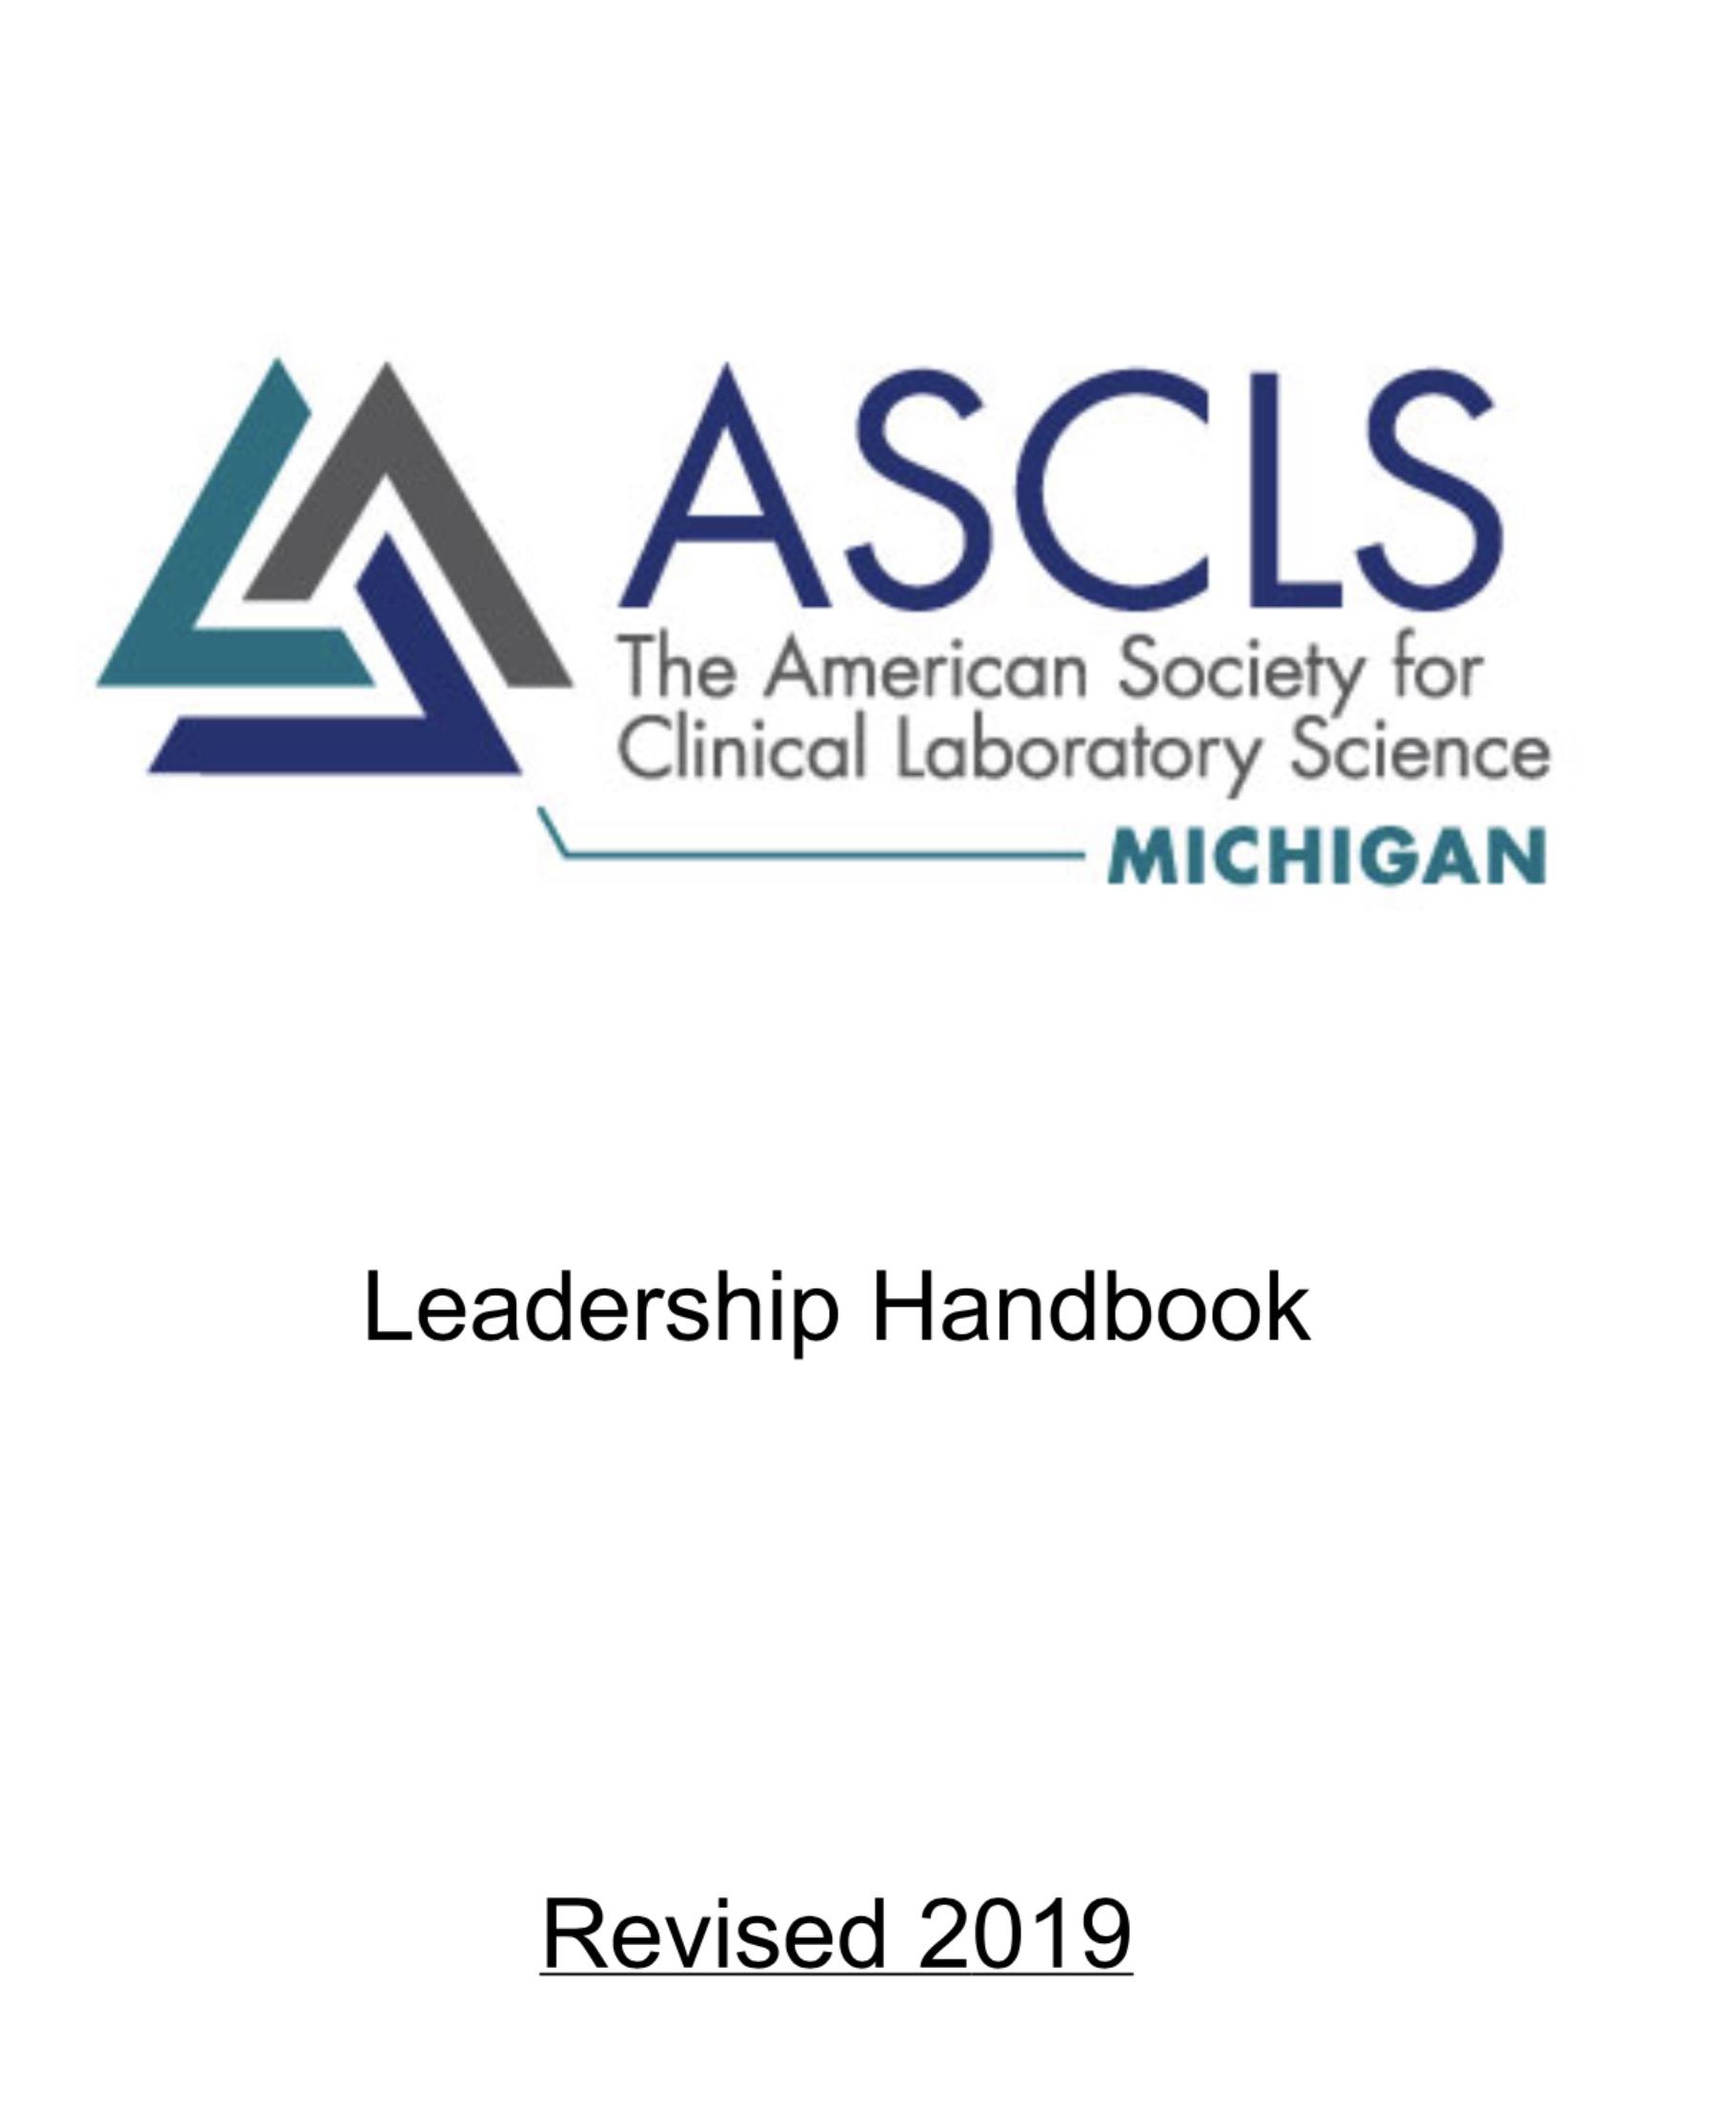 ASCLS-Michigan Leadership Handbook